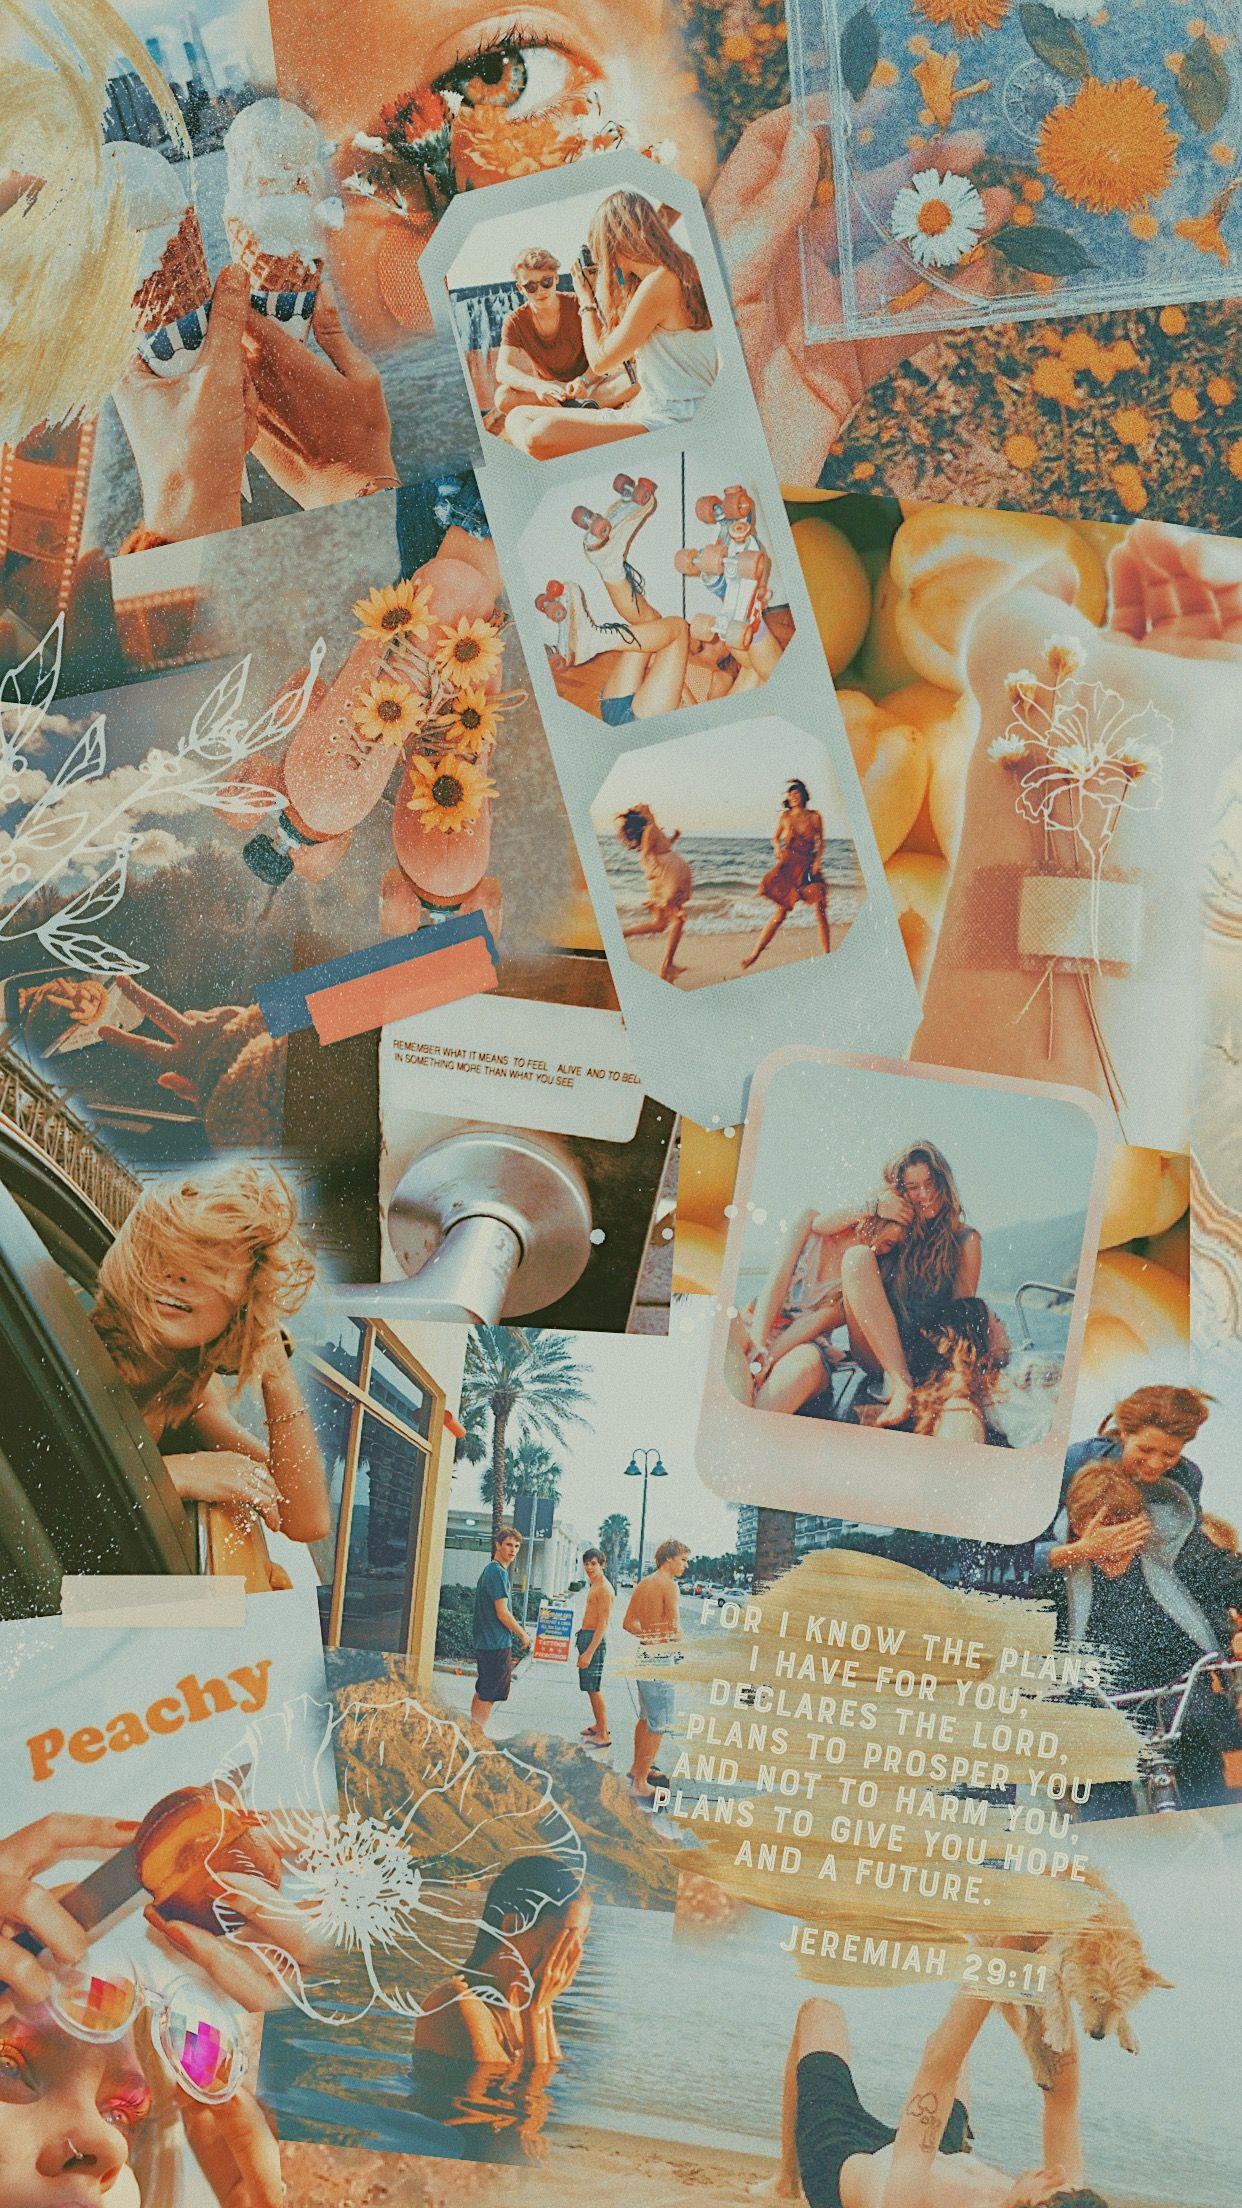 #summerstyle #summerfashion #summerfun #travelwallpaper #phonewallpaper #lockscreen #lockscreenwallpaper #aesthetic #collage #vacation #collagewallpaper #tumblrwallpaper #baecation #sunkissed #wanderlust #photocollage #iphonewallpaper #travelblogger #travelphotography